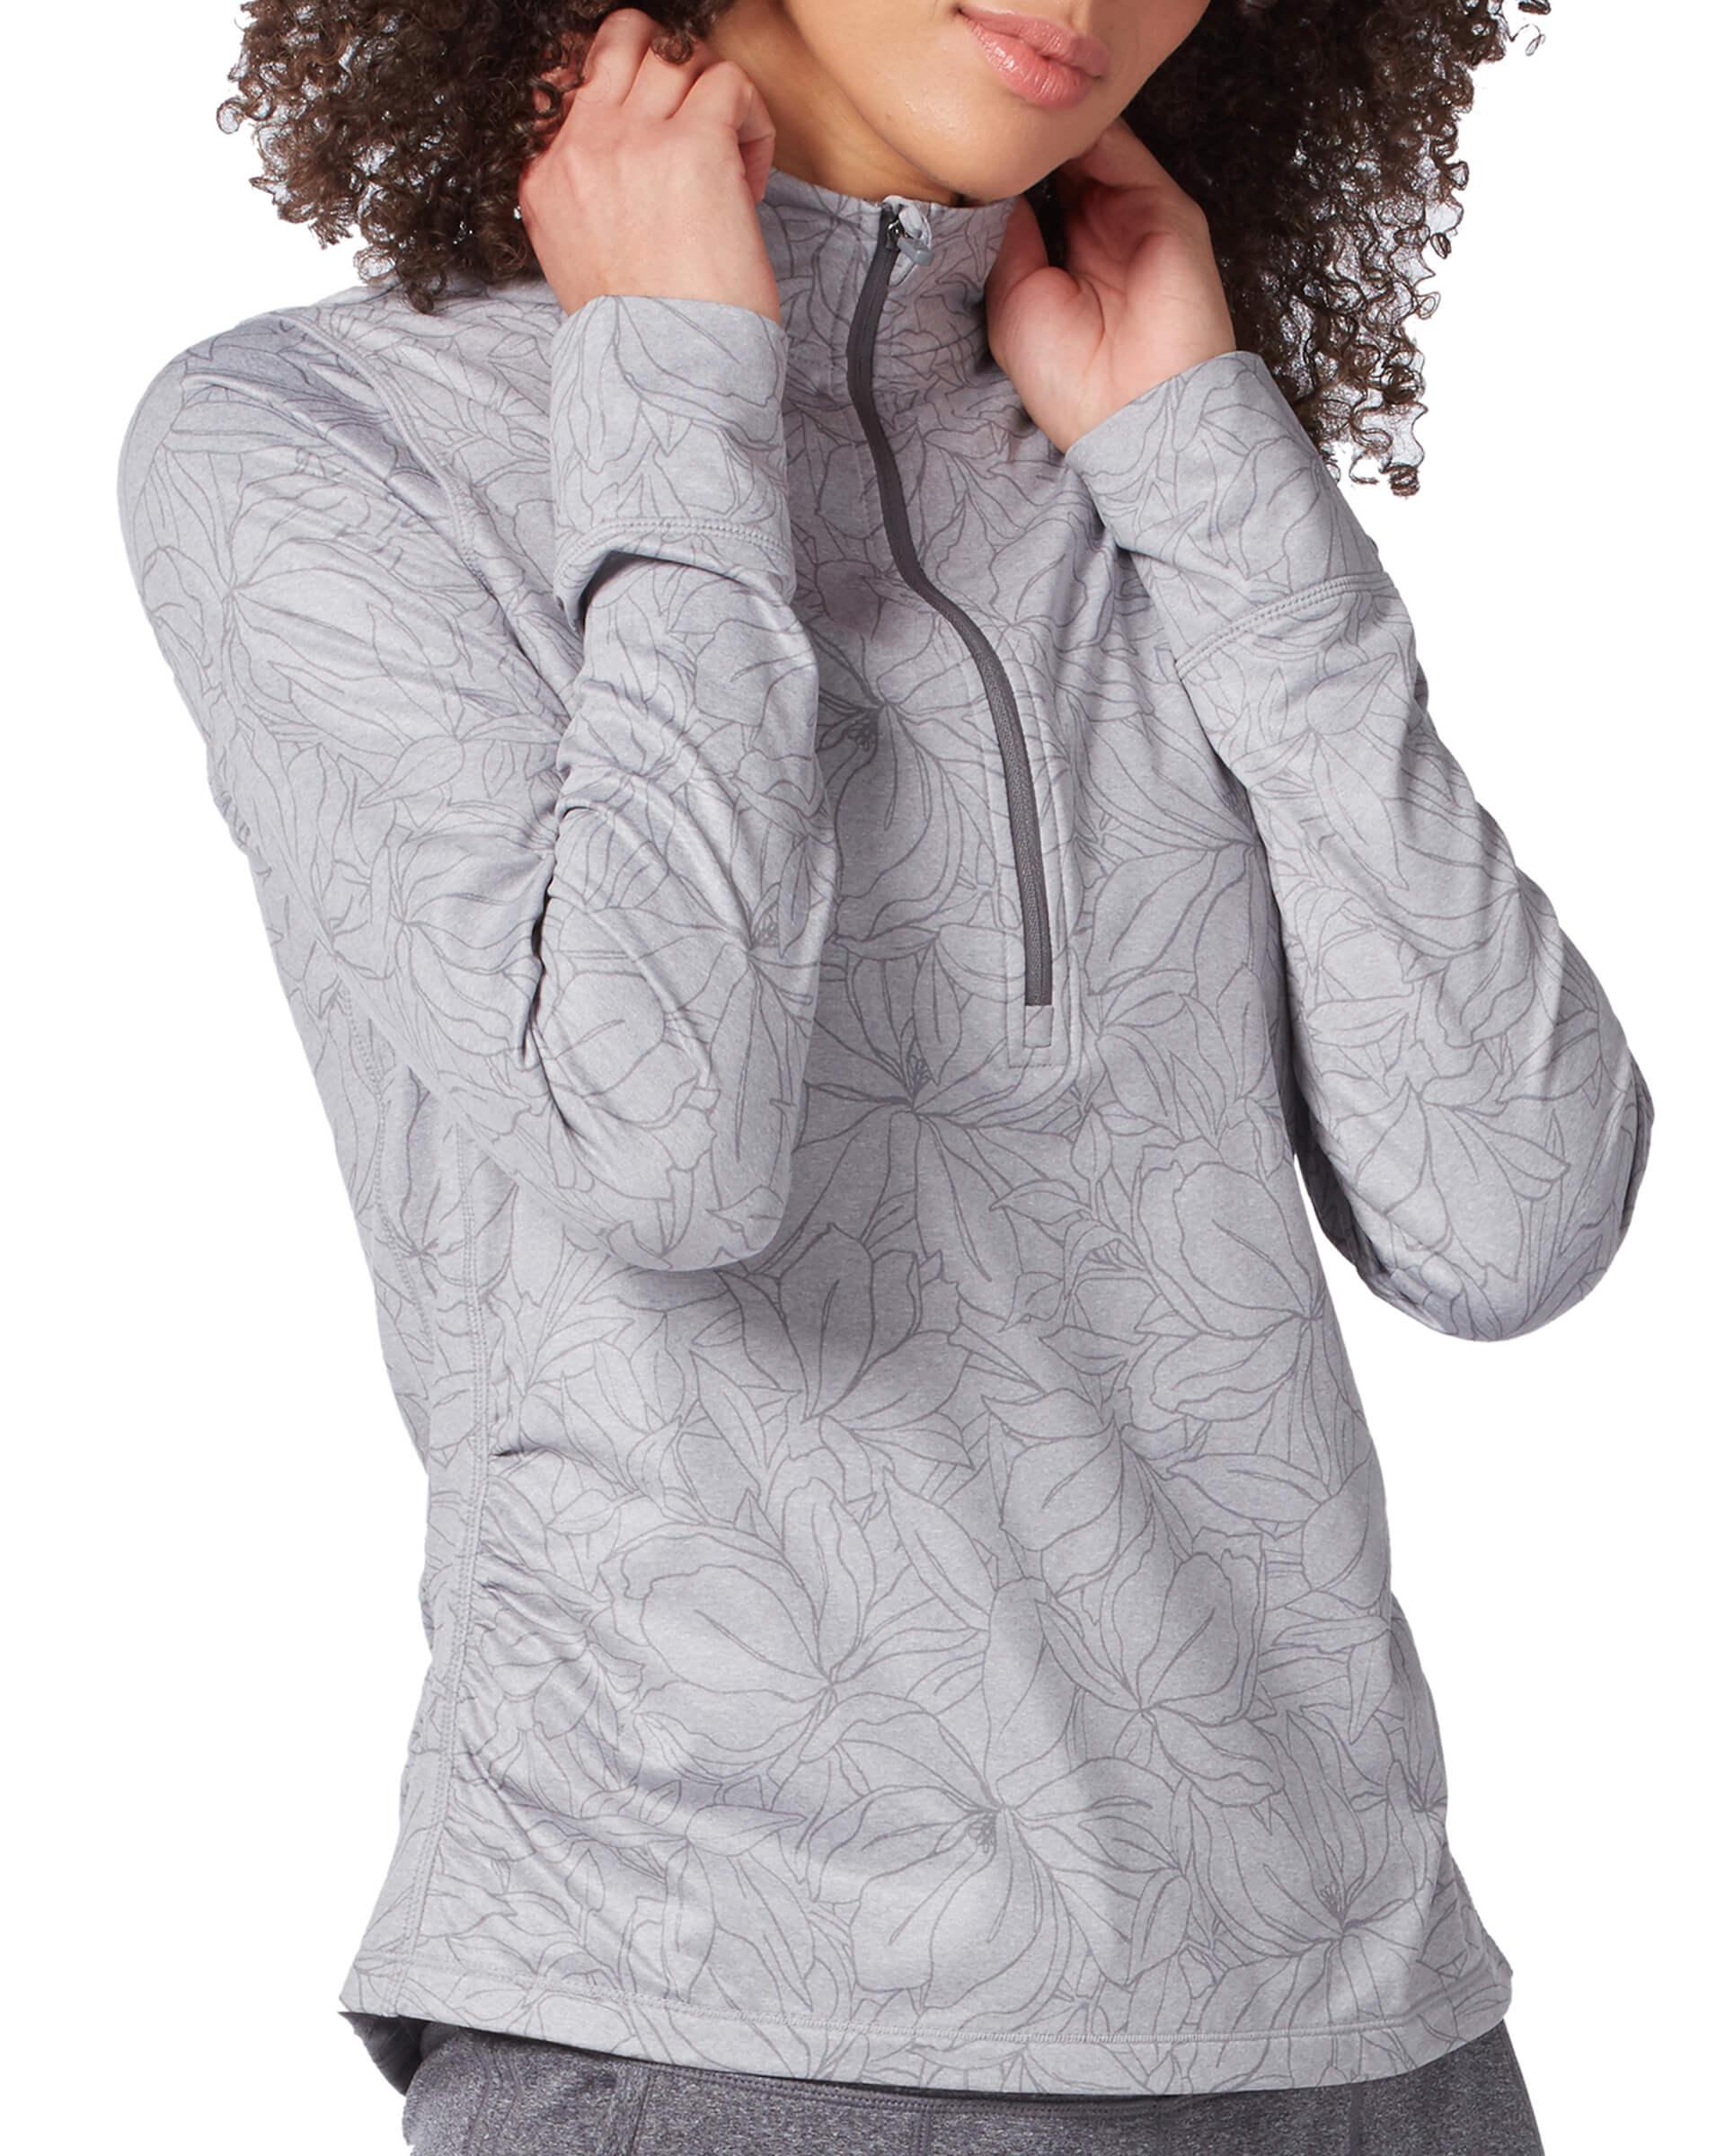 Women's Free2B B Cozy Long Sleeve Top